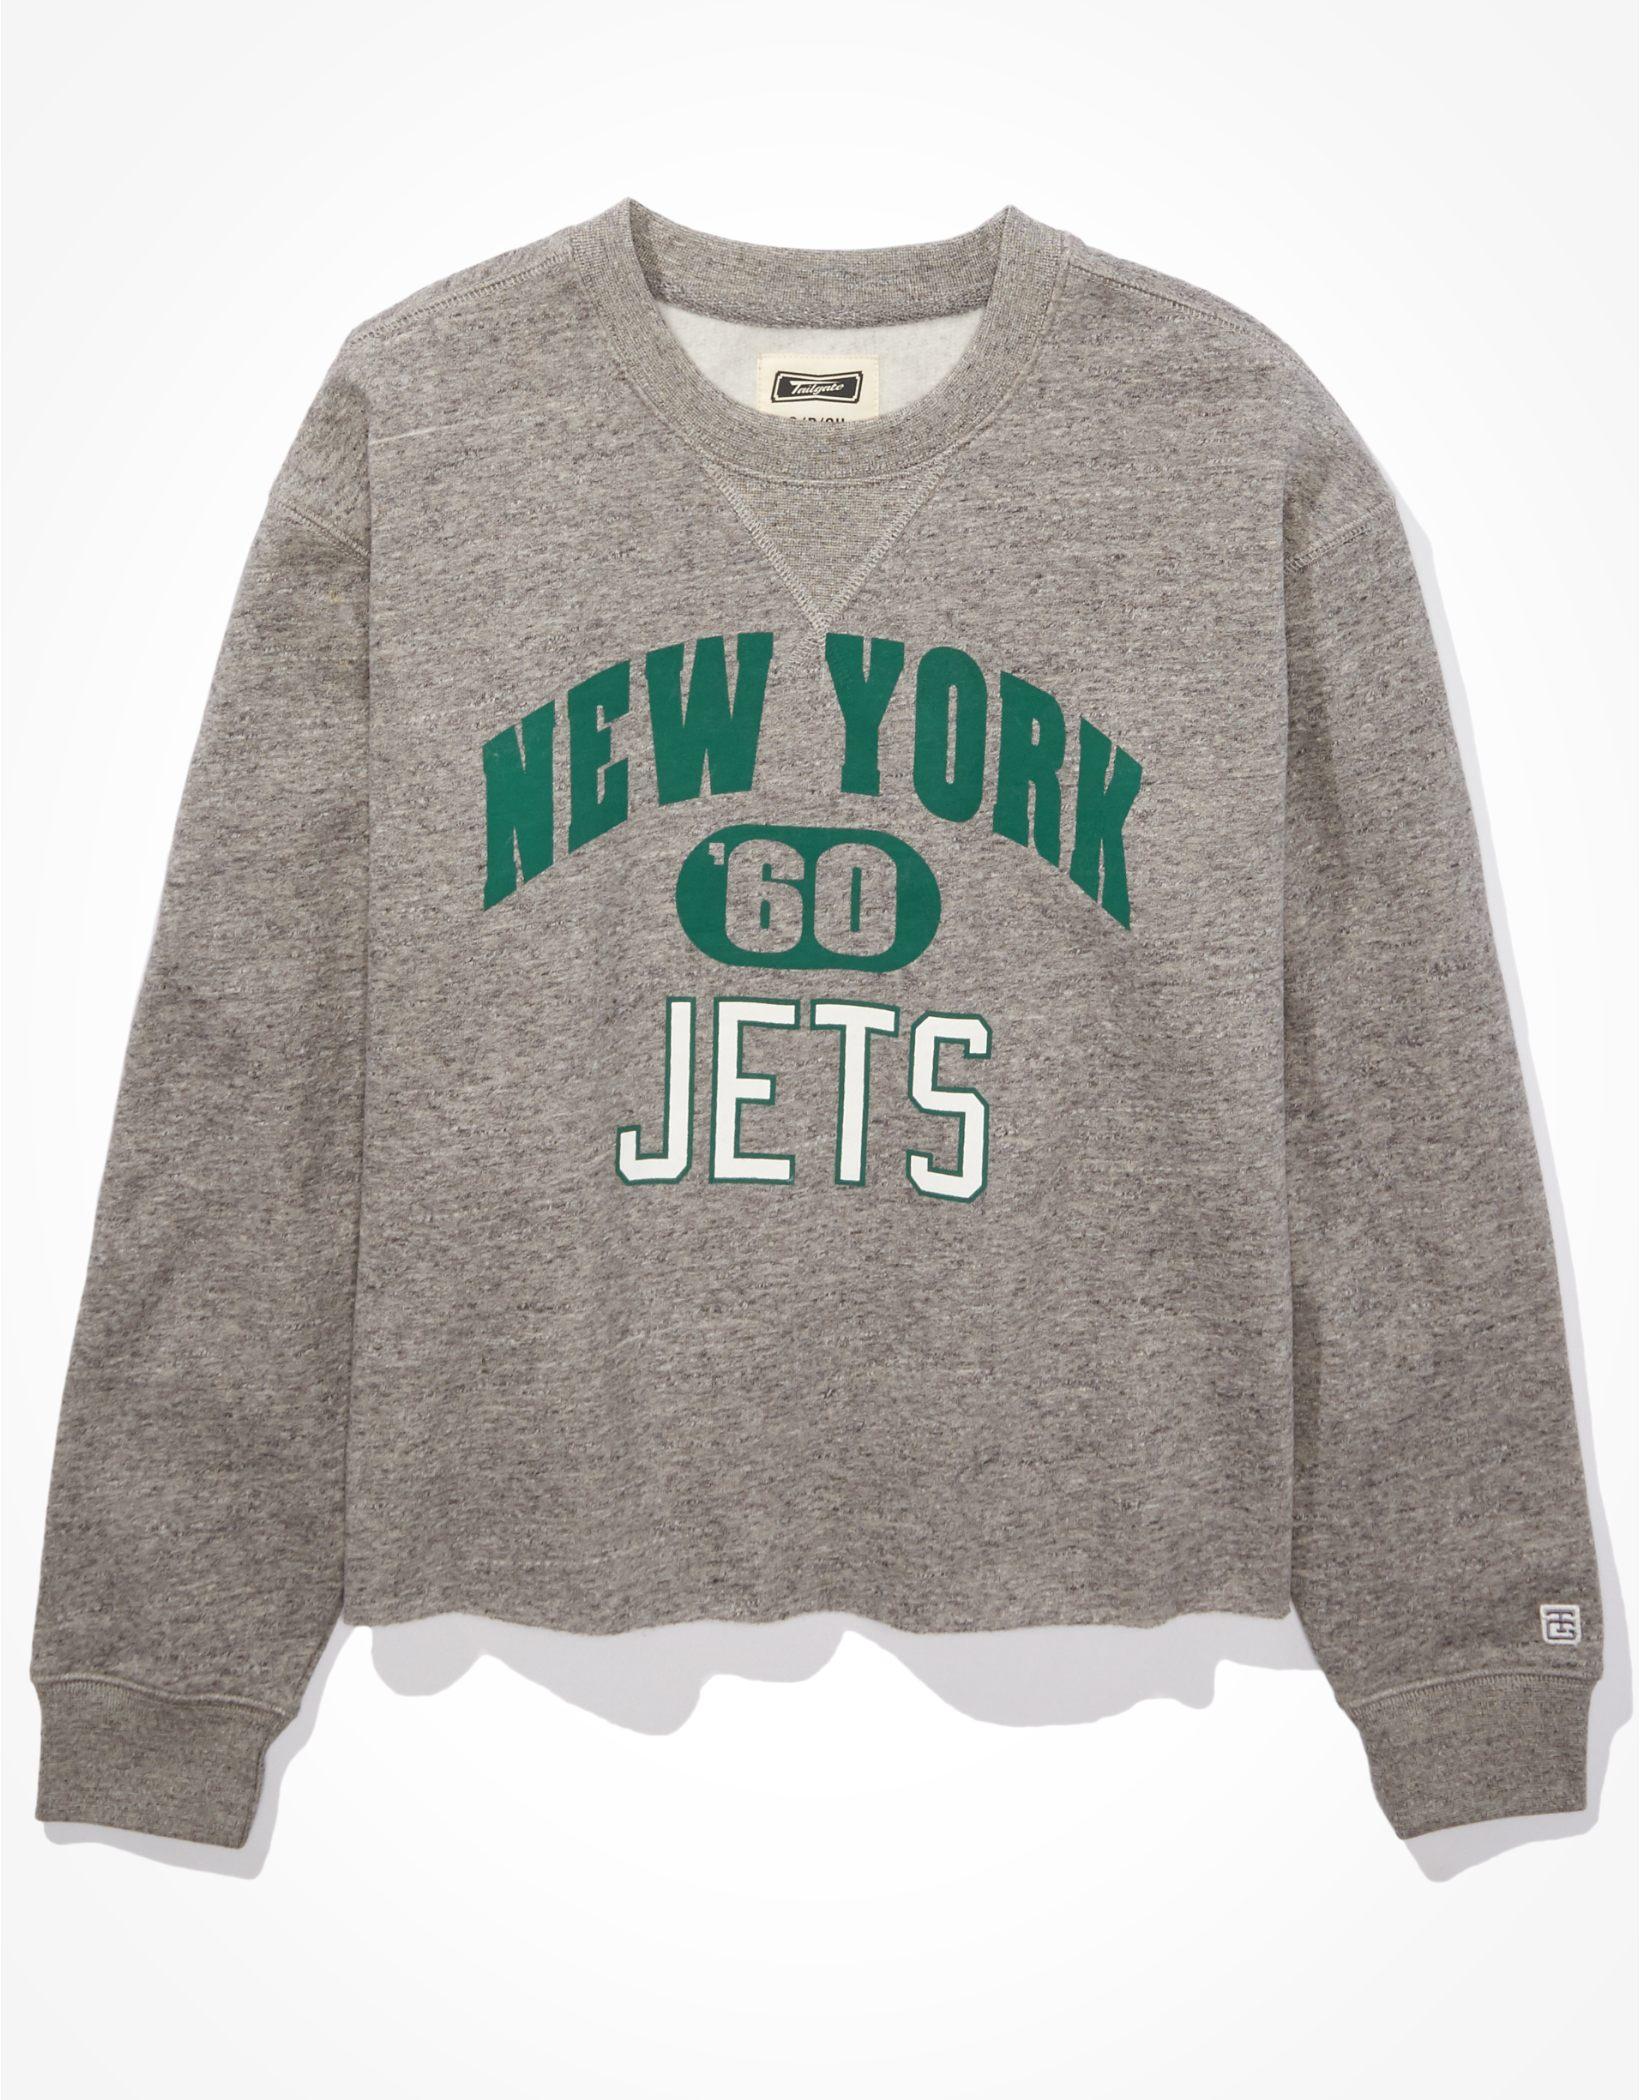 Tailgate Women's New York Jets Cut-Off Sweatshirt